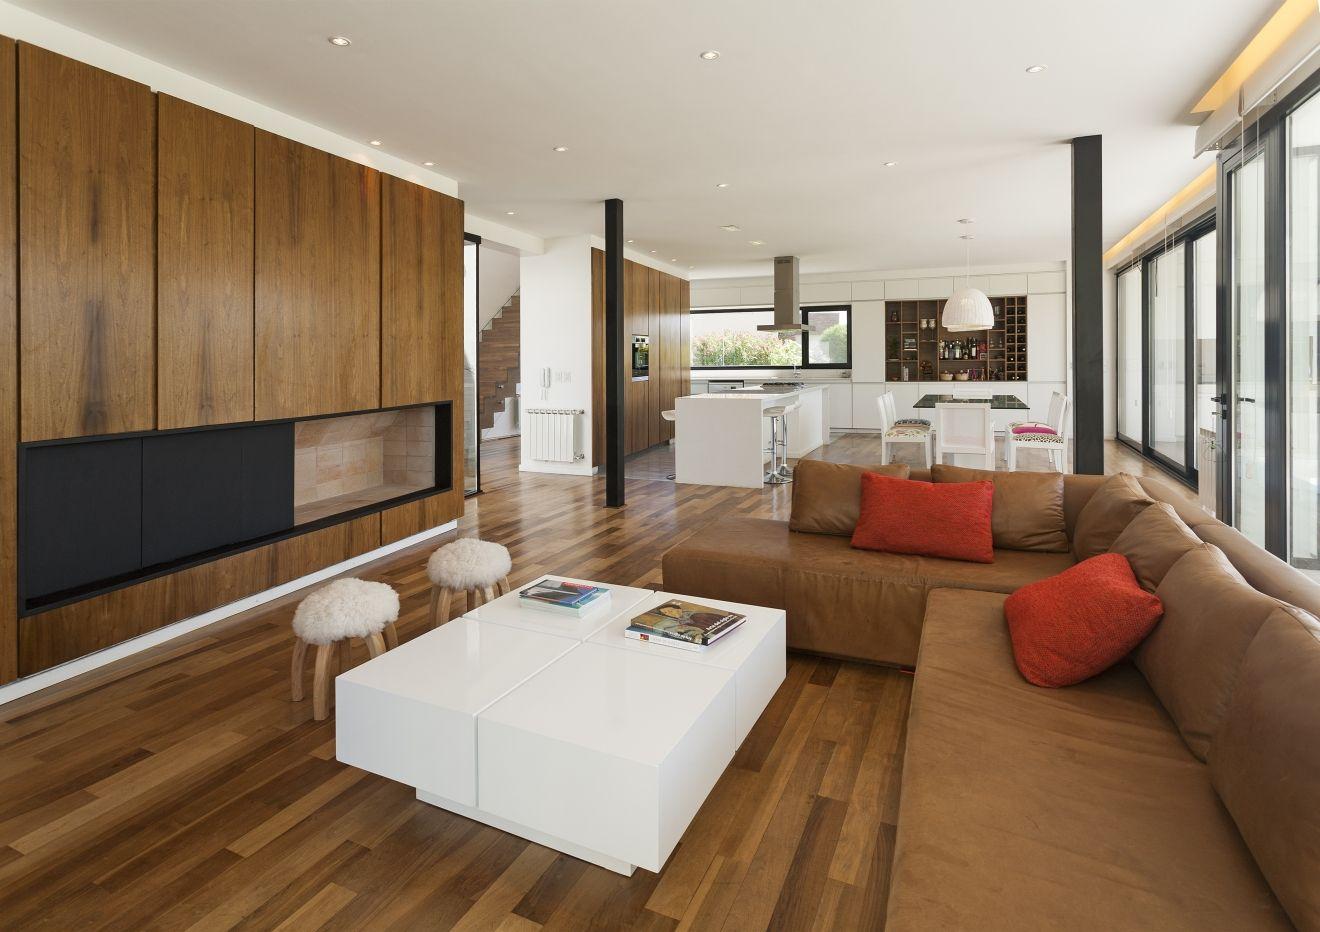 planos de casa de dos pisos moderna, construcción con posibilidad